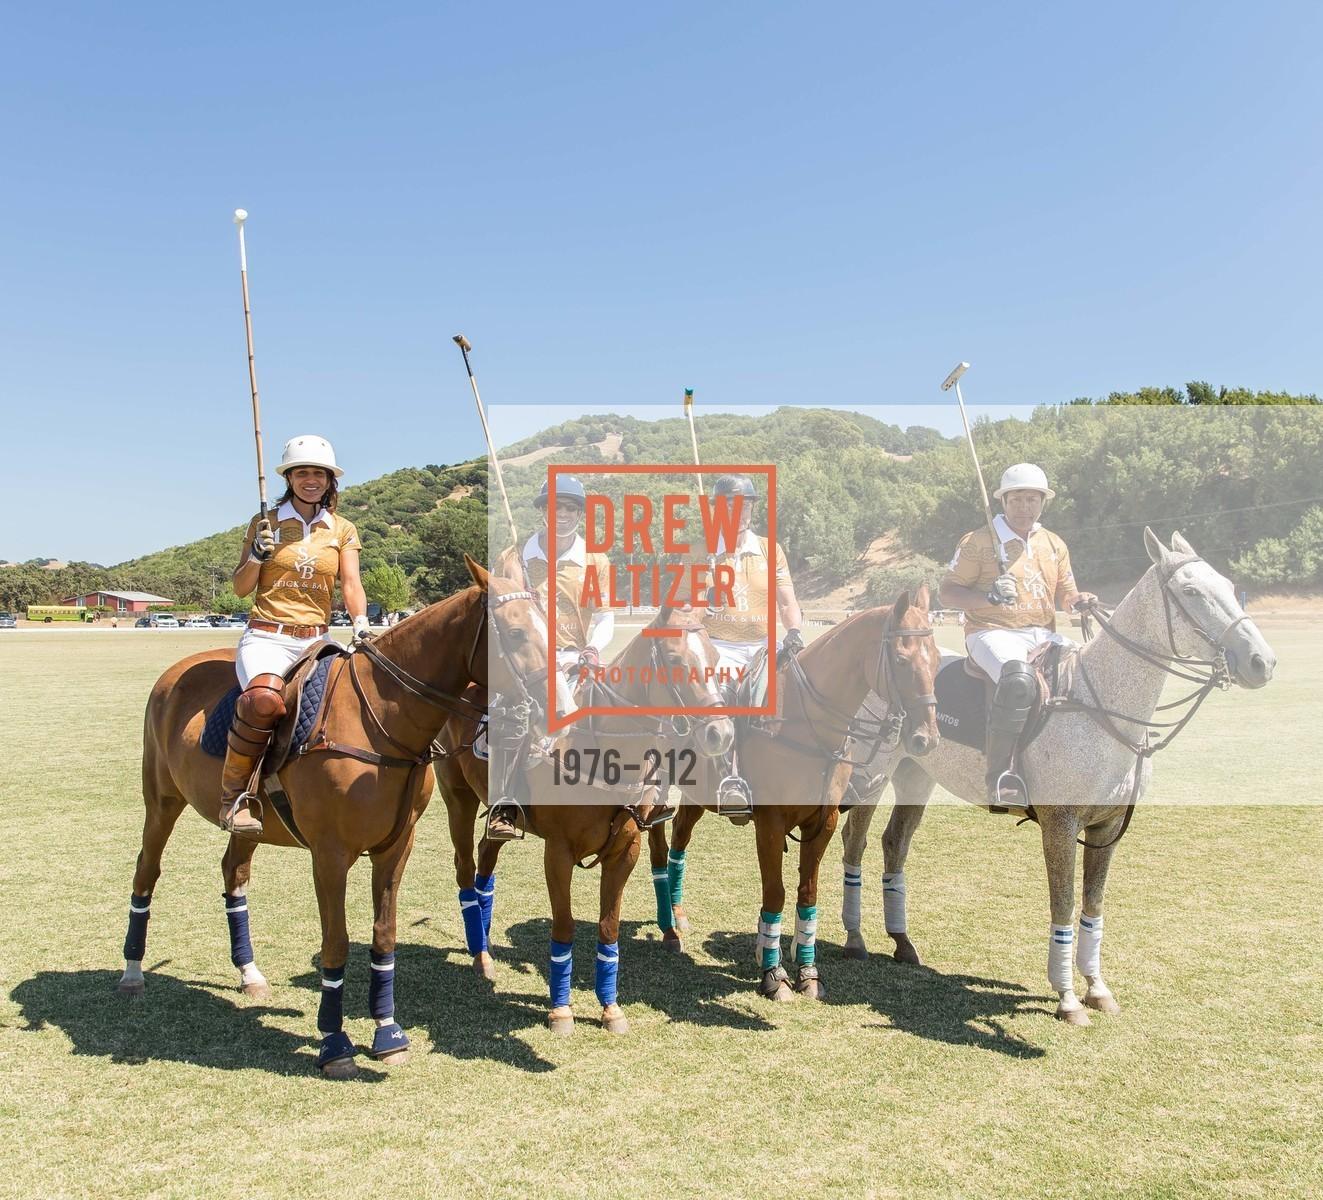 Elizabeth Welborn, Pat Nesbitt, Santos Arriola, Stick & Ball Oyster Cup Polo Tournament, Cerro Pampa Polo Club, July 25th, 2015